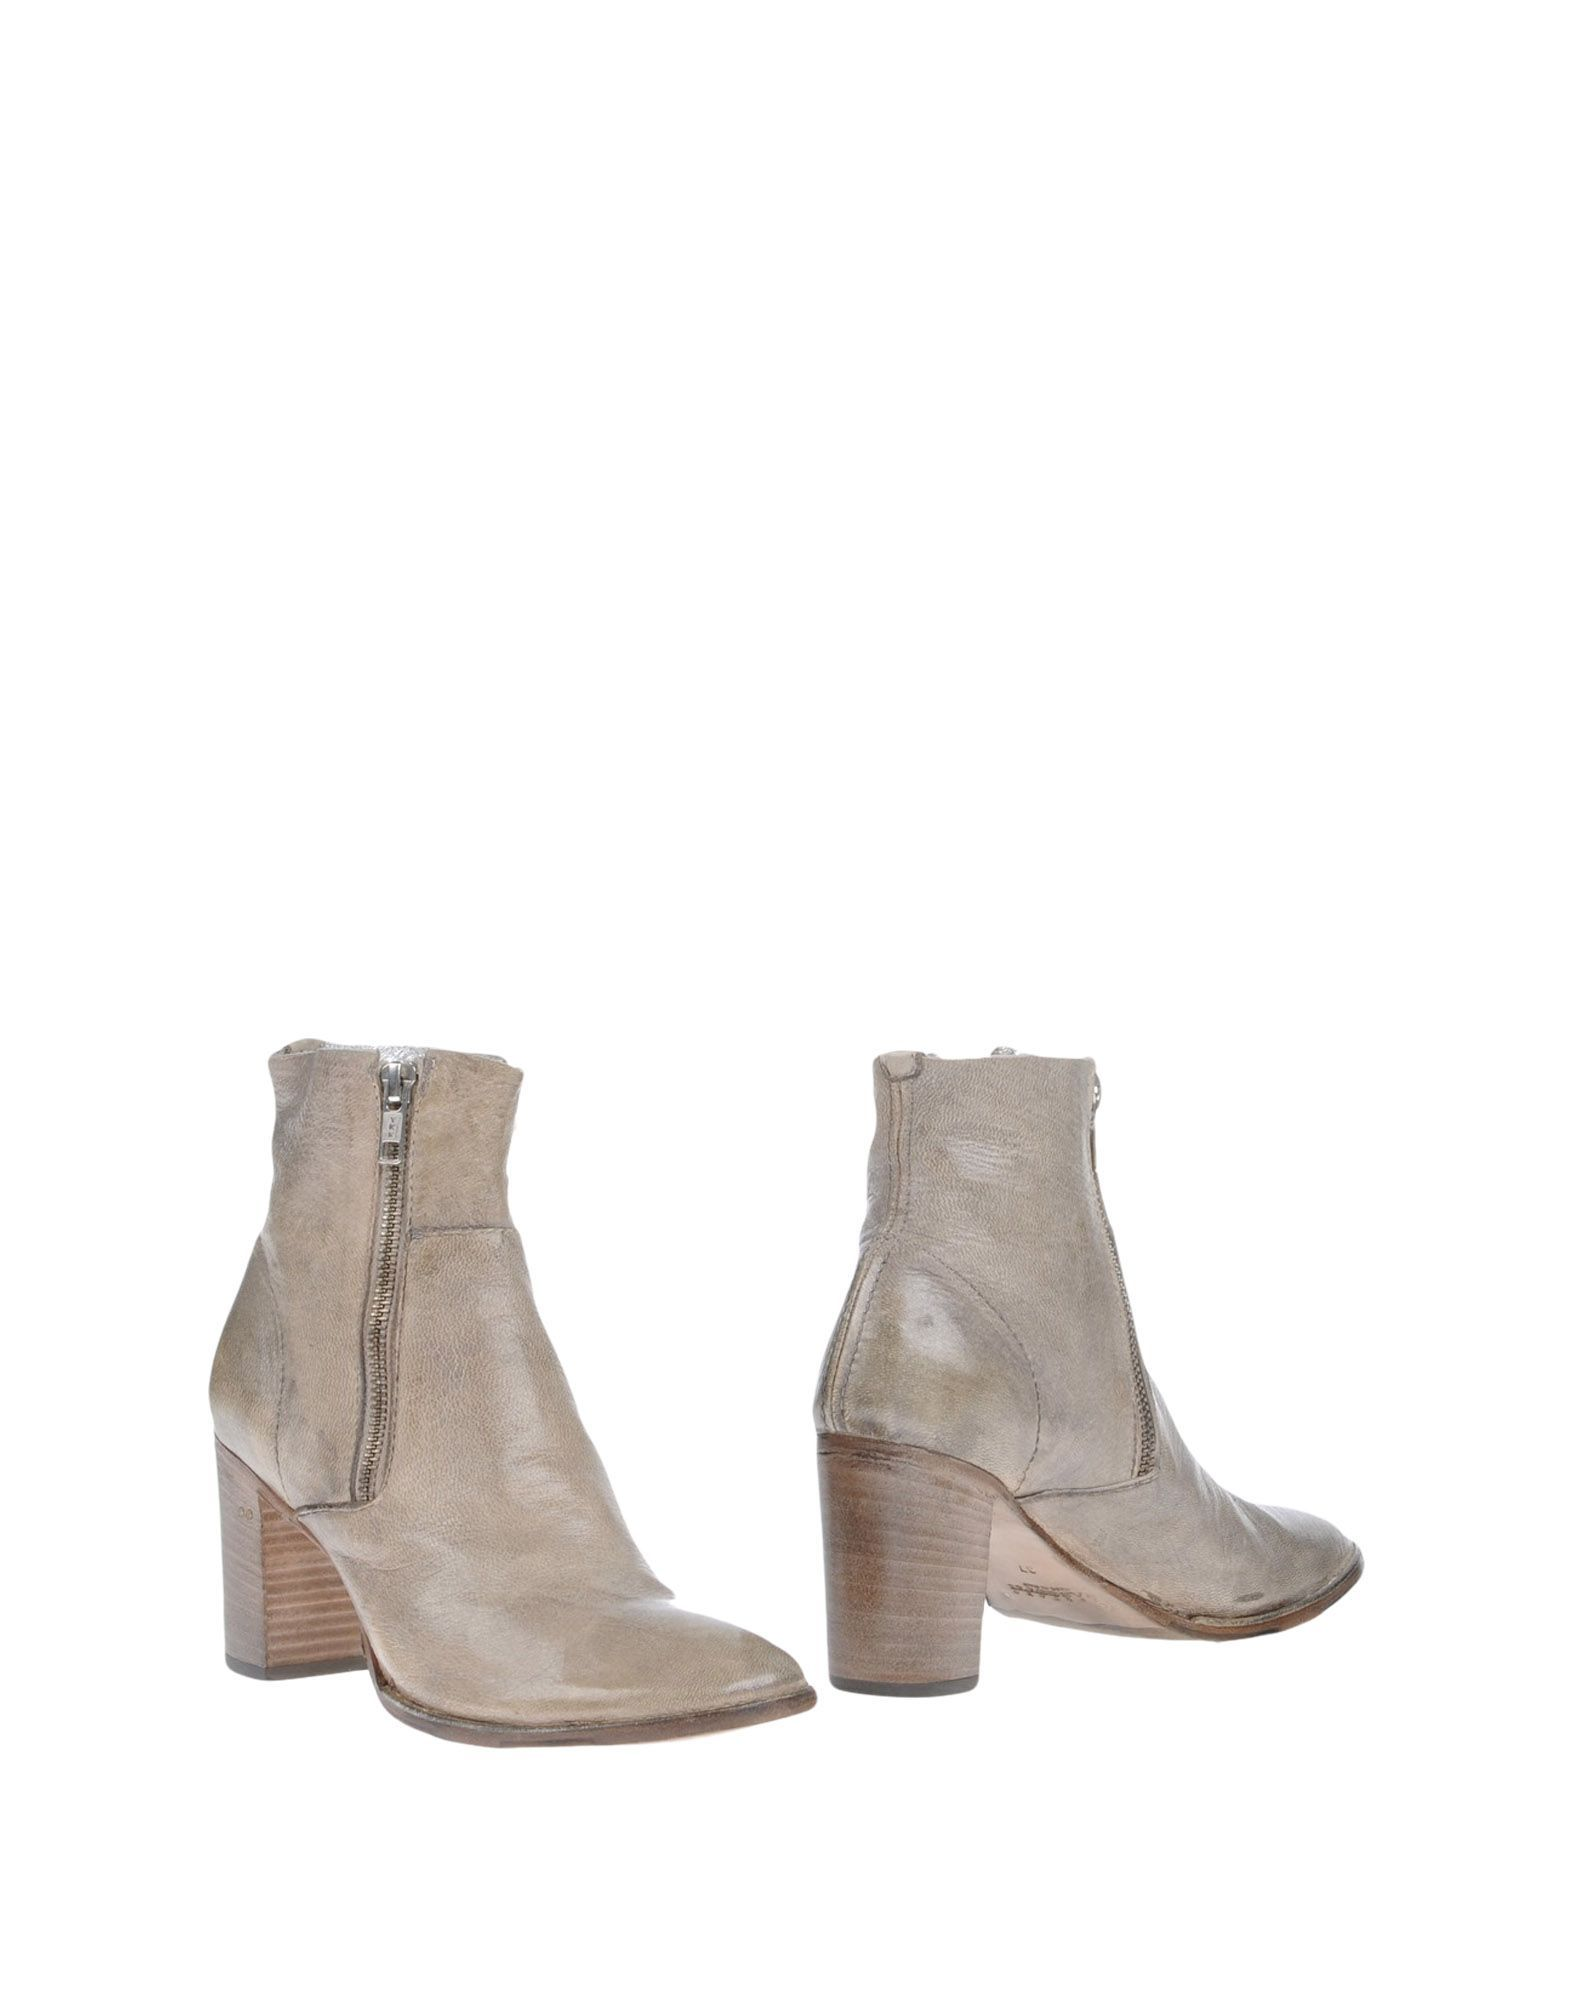 ankle cowboy boots - Brown Silvano Sassetti w6iL8gzh